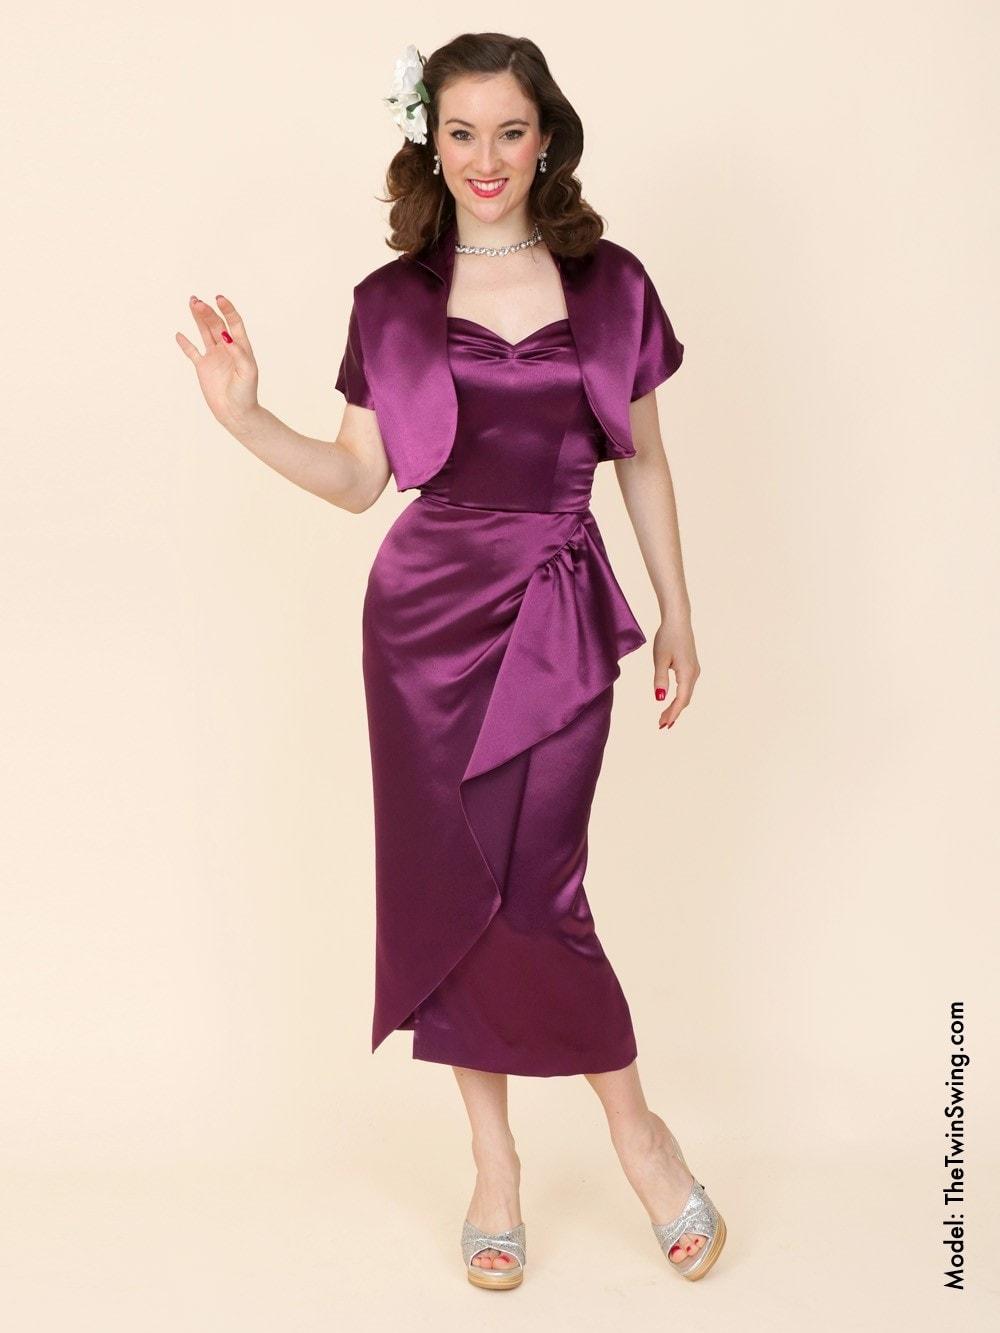 9bd920ccbc 40s-1940s-Vivien-of-Holloway-Best-Vintage-Reproduction-